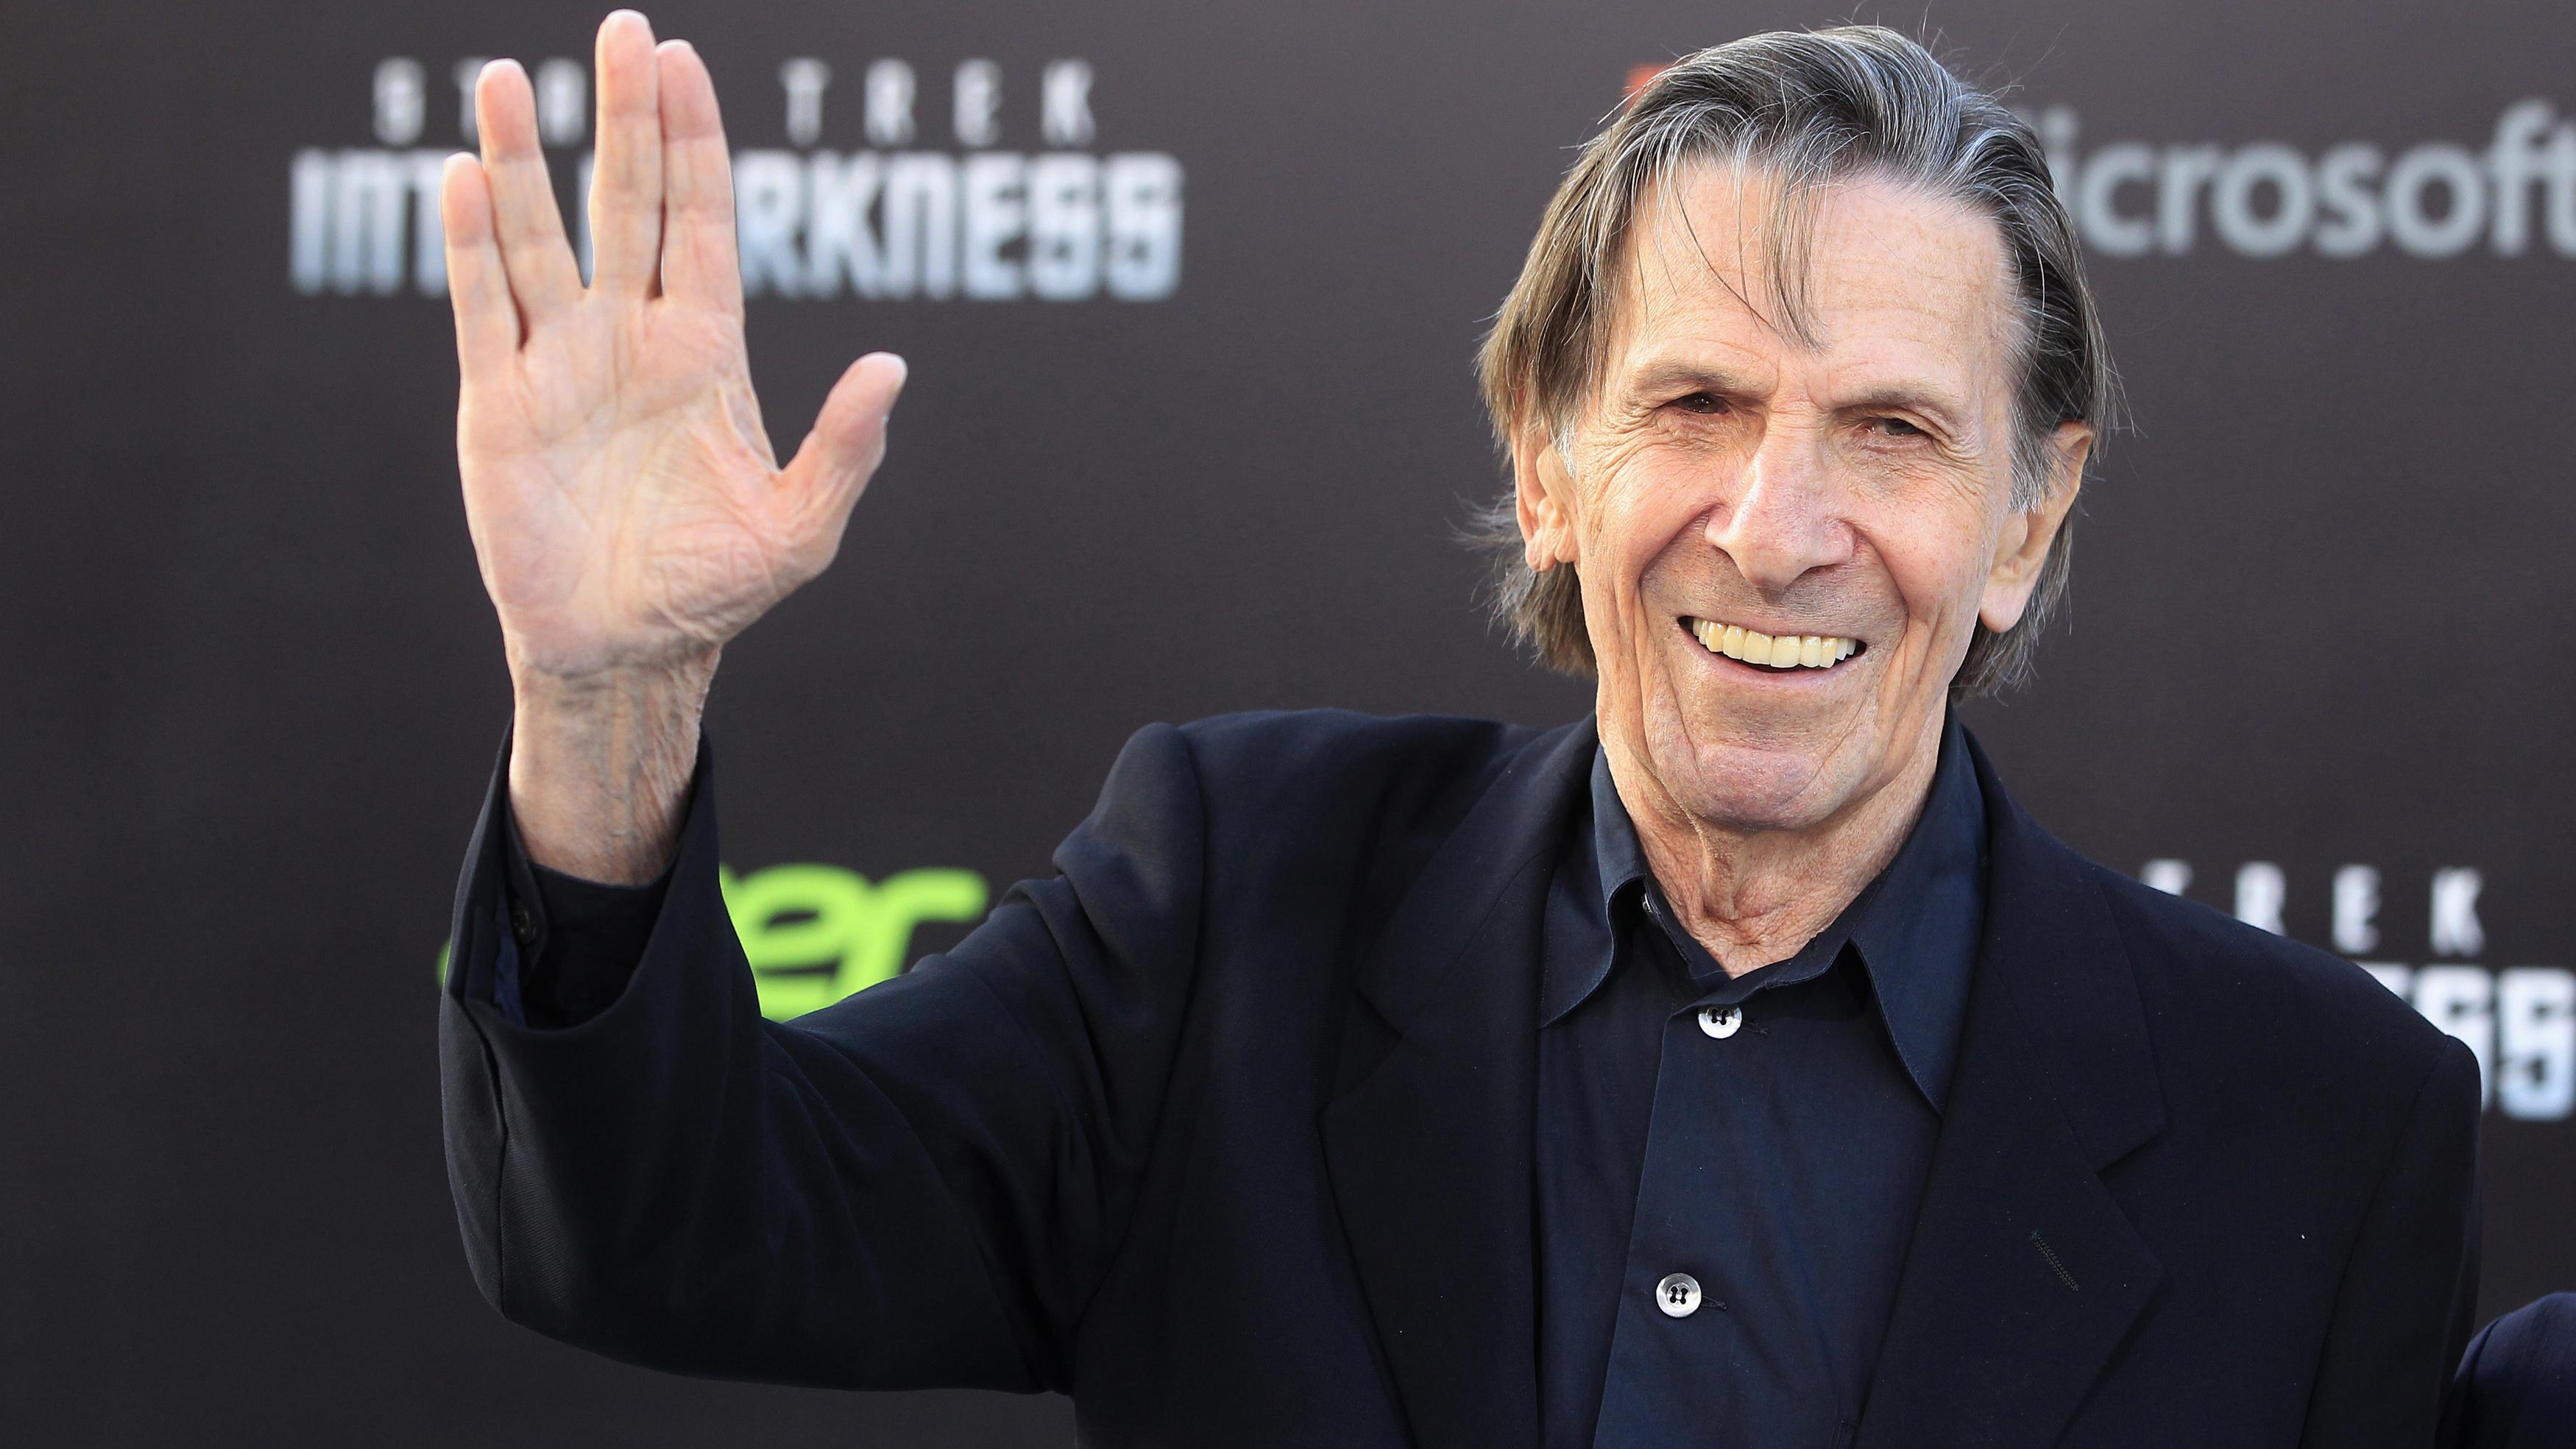 leonard nimoy star trek s spock dies at 83 public